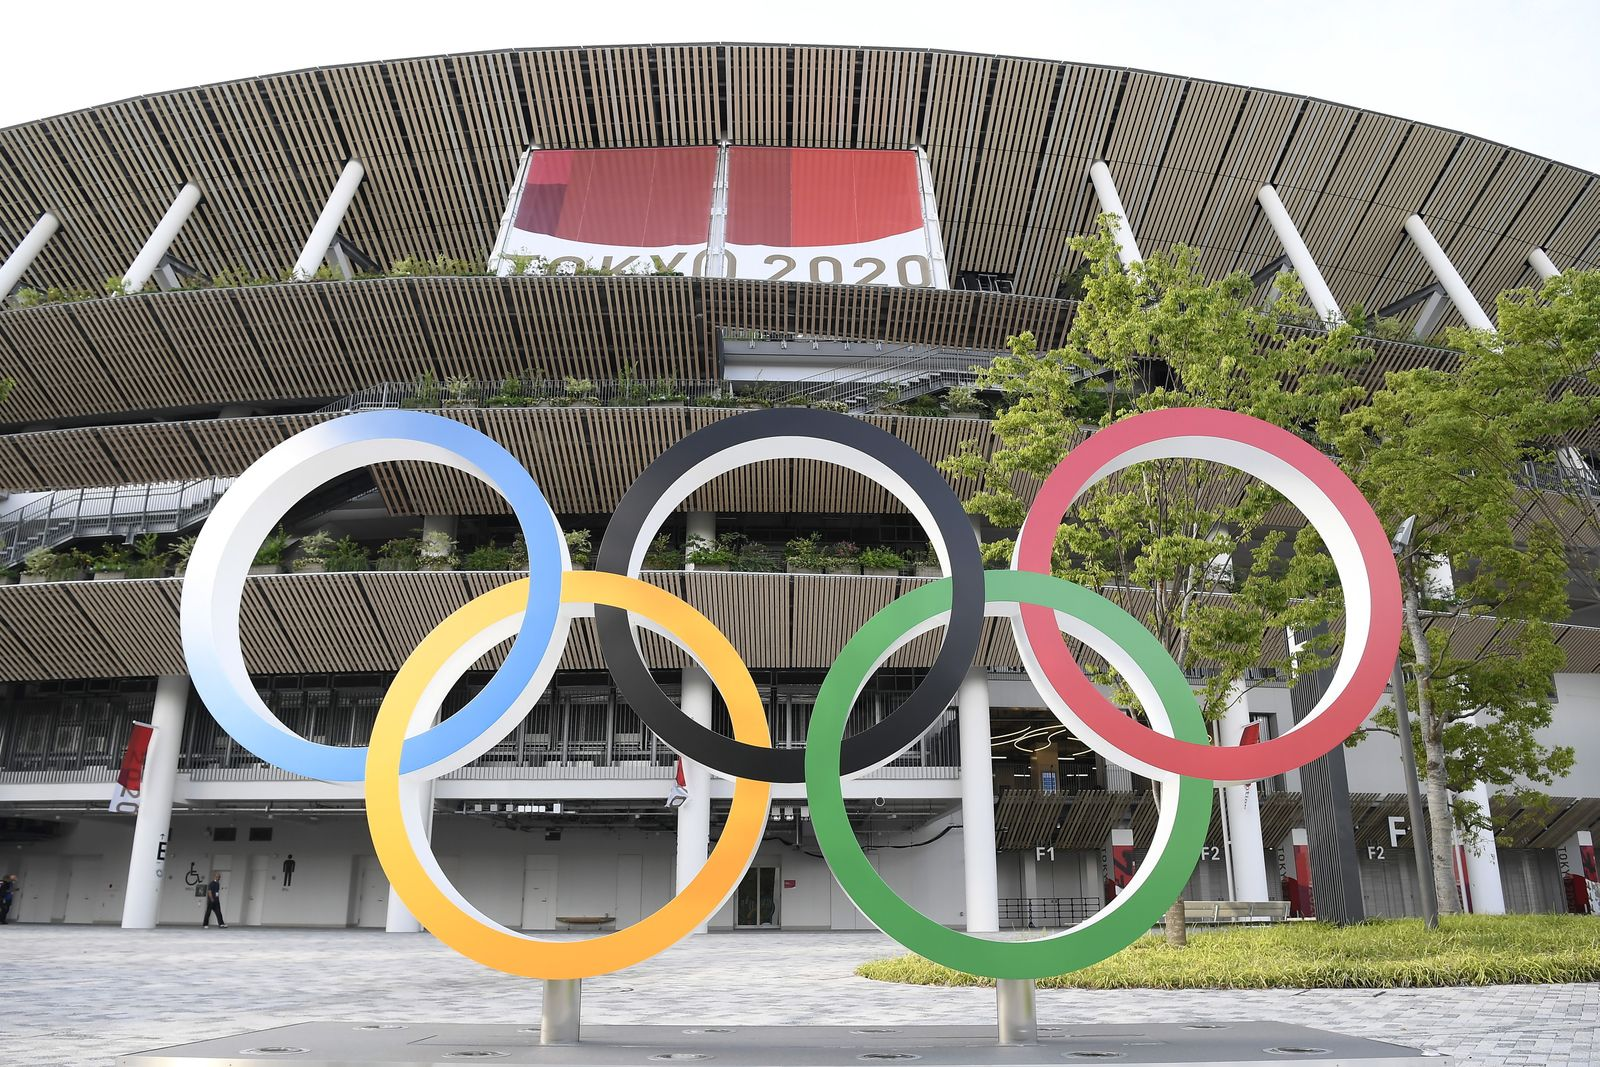 Tokyo 2020 games amid COVID-19 pandemic